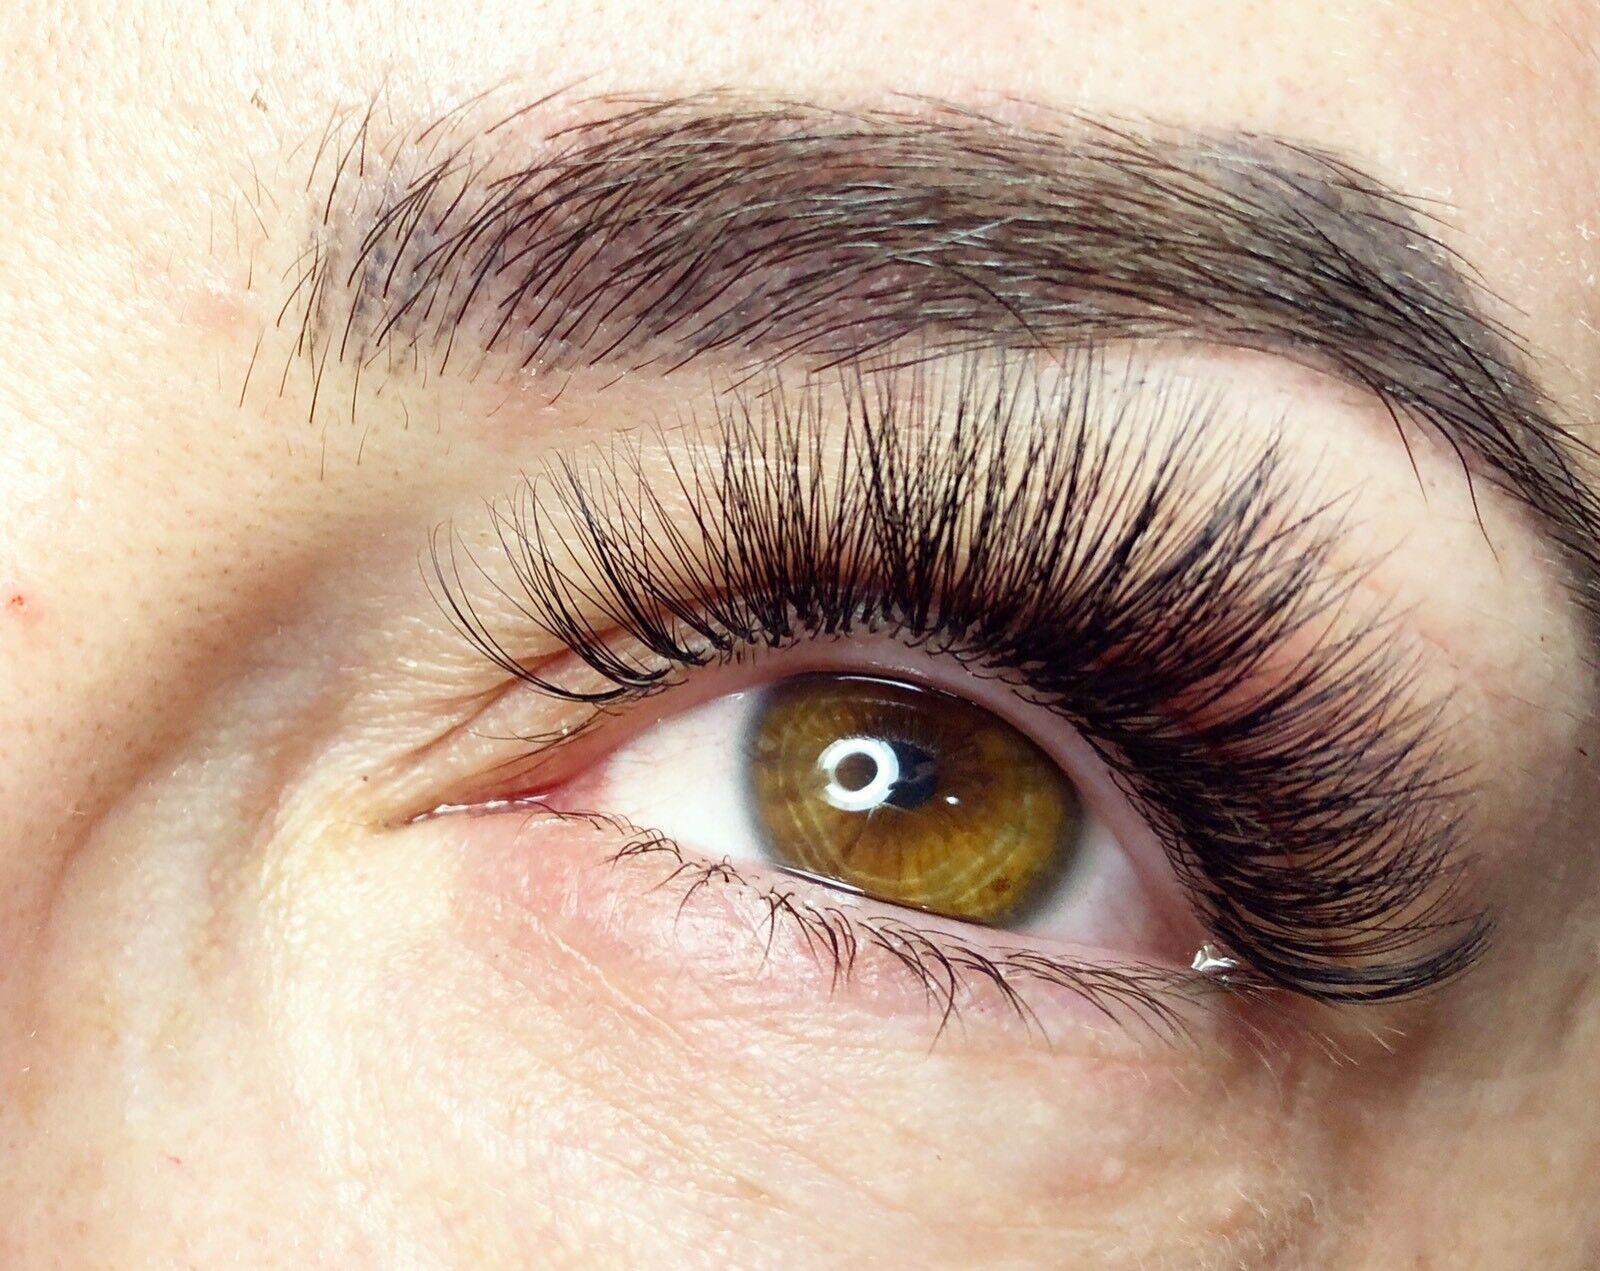 Eyelash Extensions Beauty Treatments Gumtree Australia Stirling